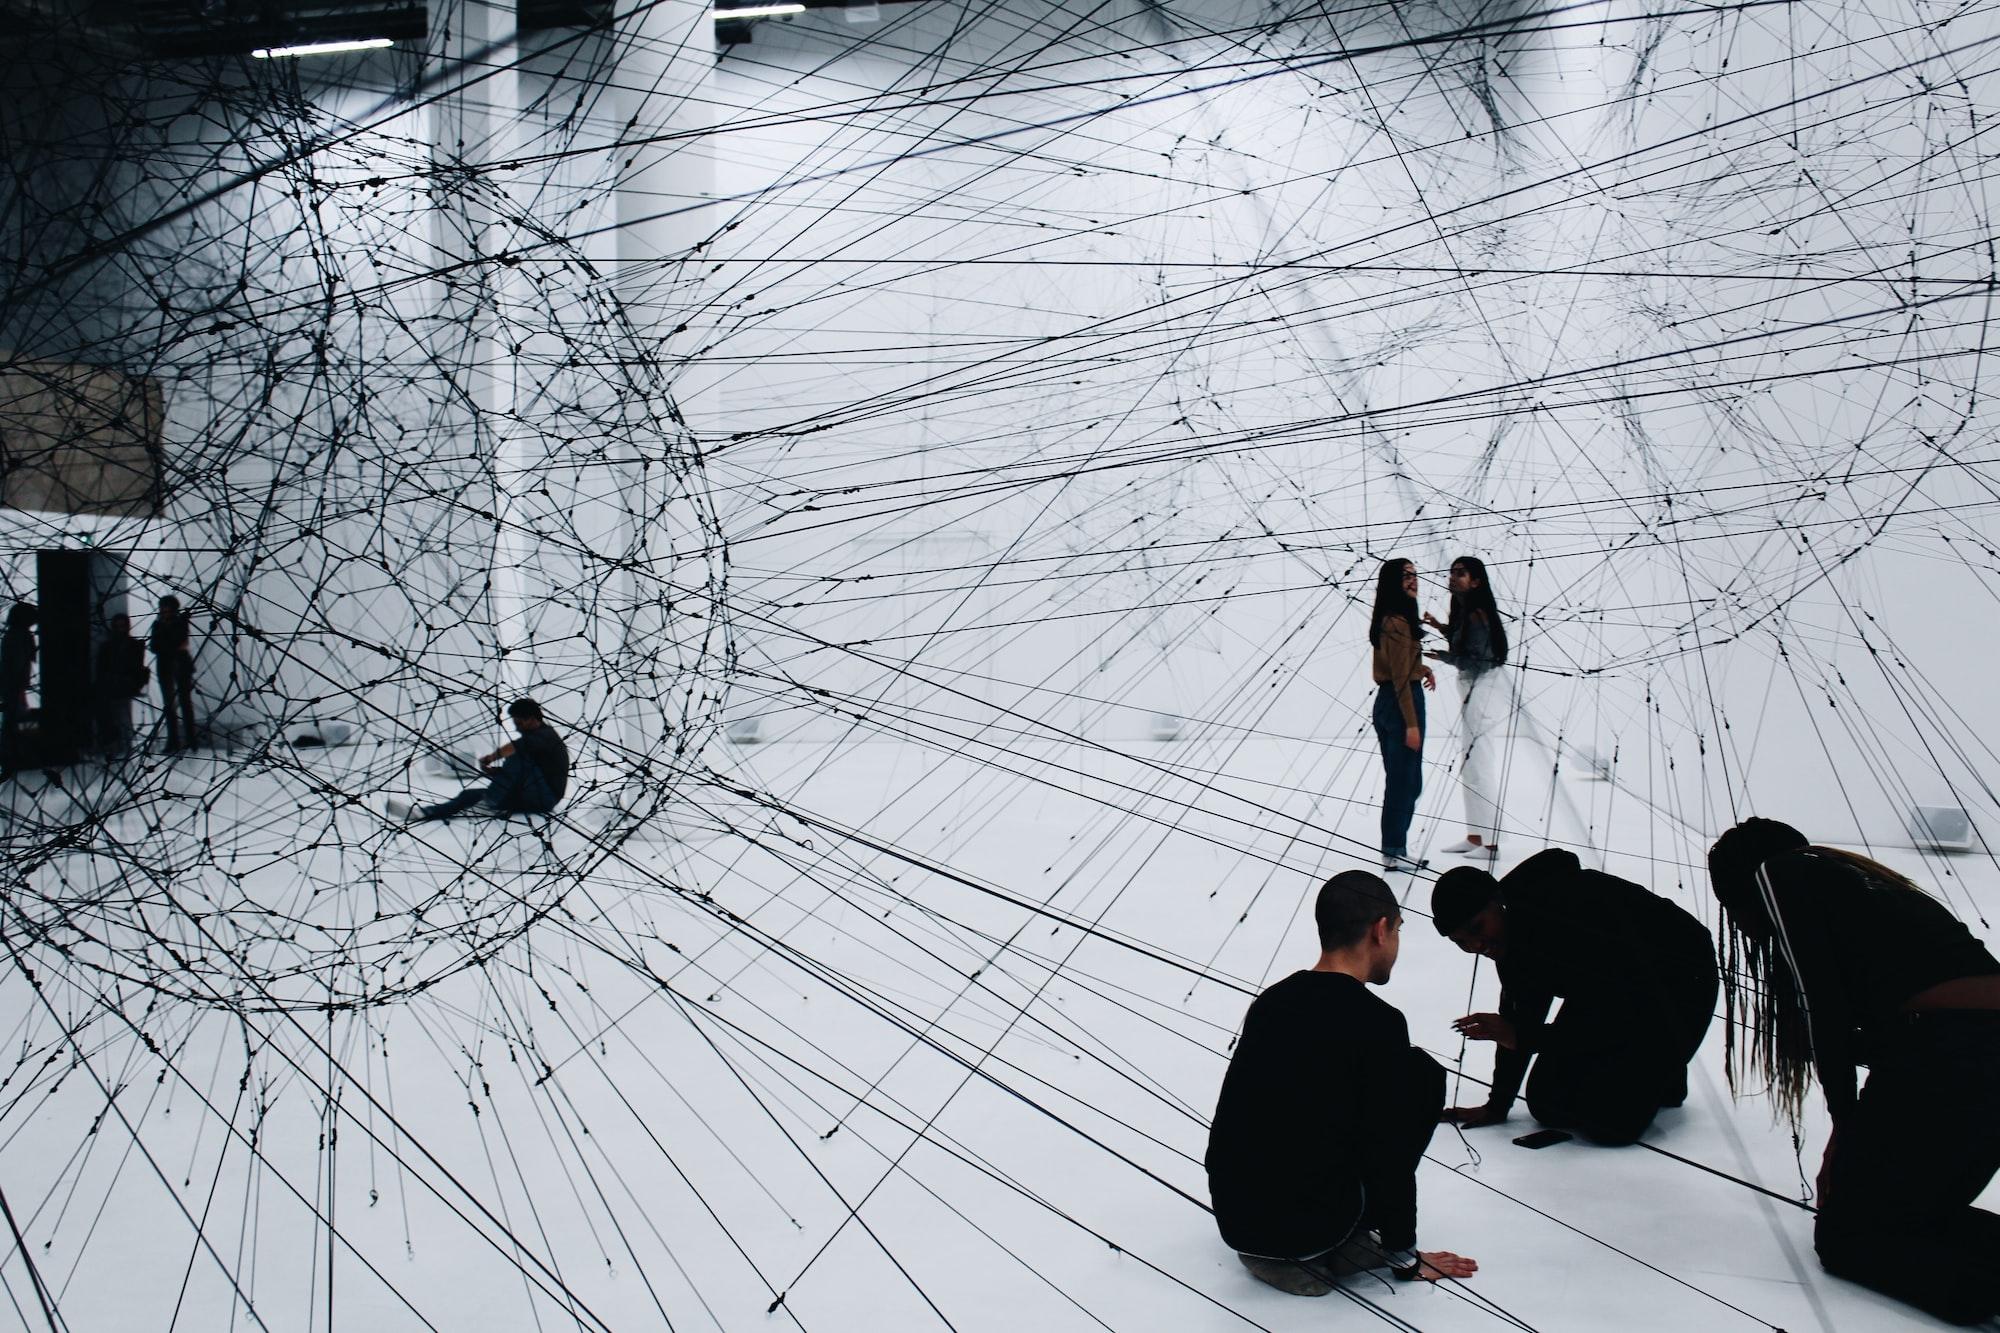 Netzwerkadministration & Netzwerkdesign, Data Center